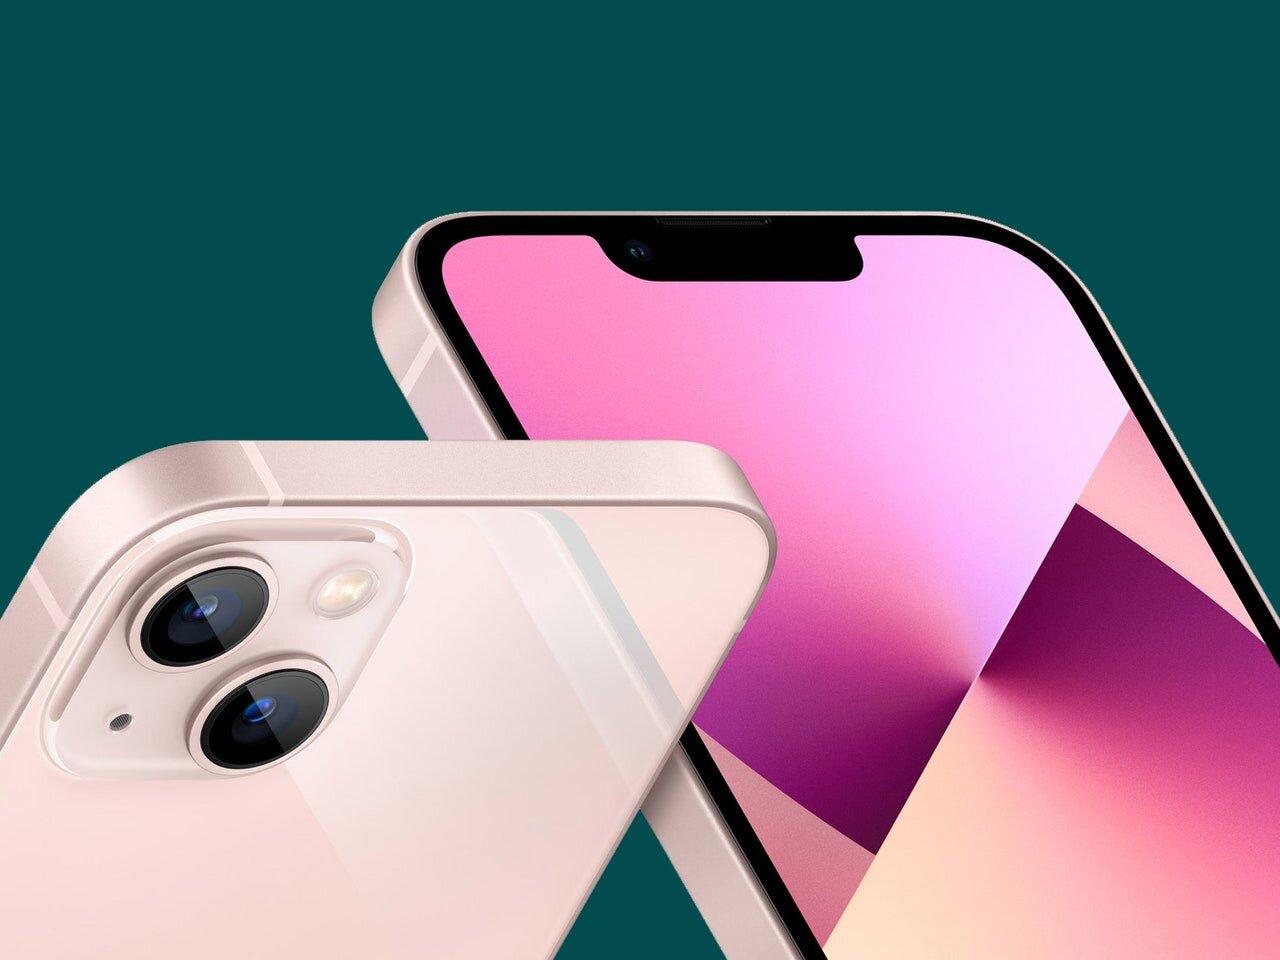 Iphone 13 mini màu hồng